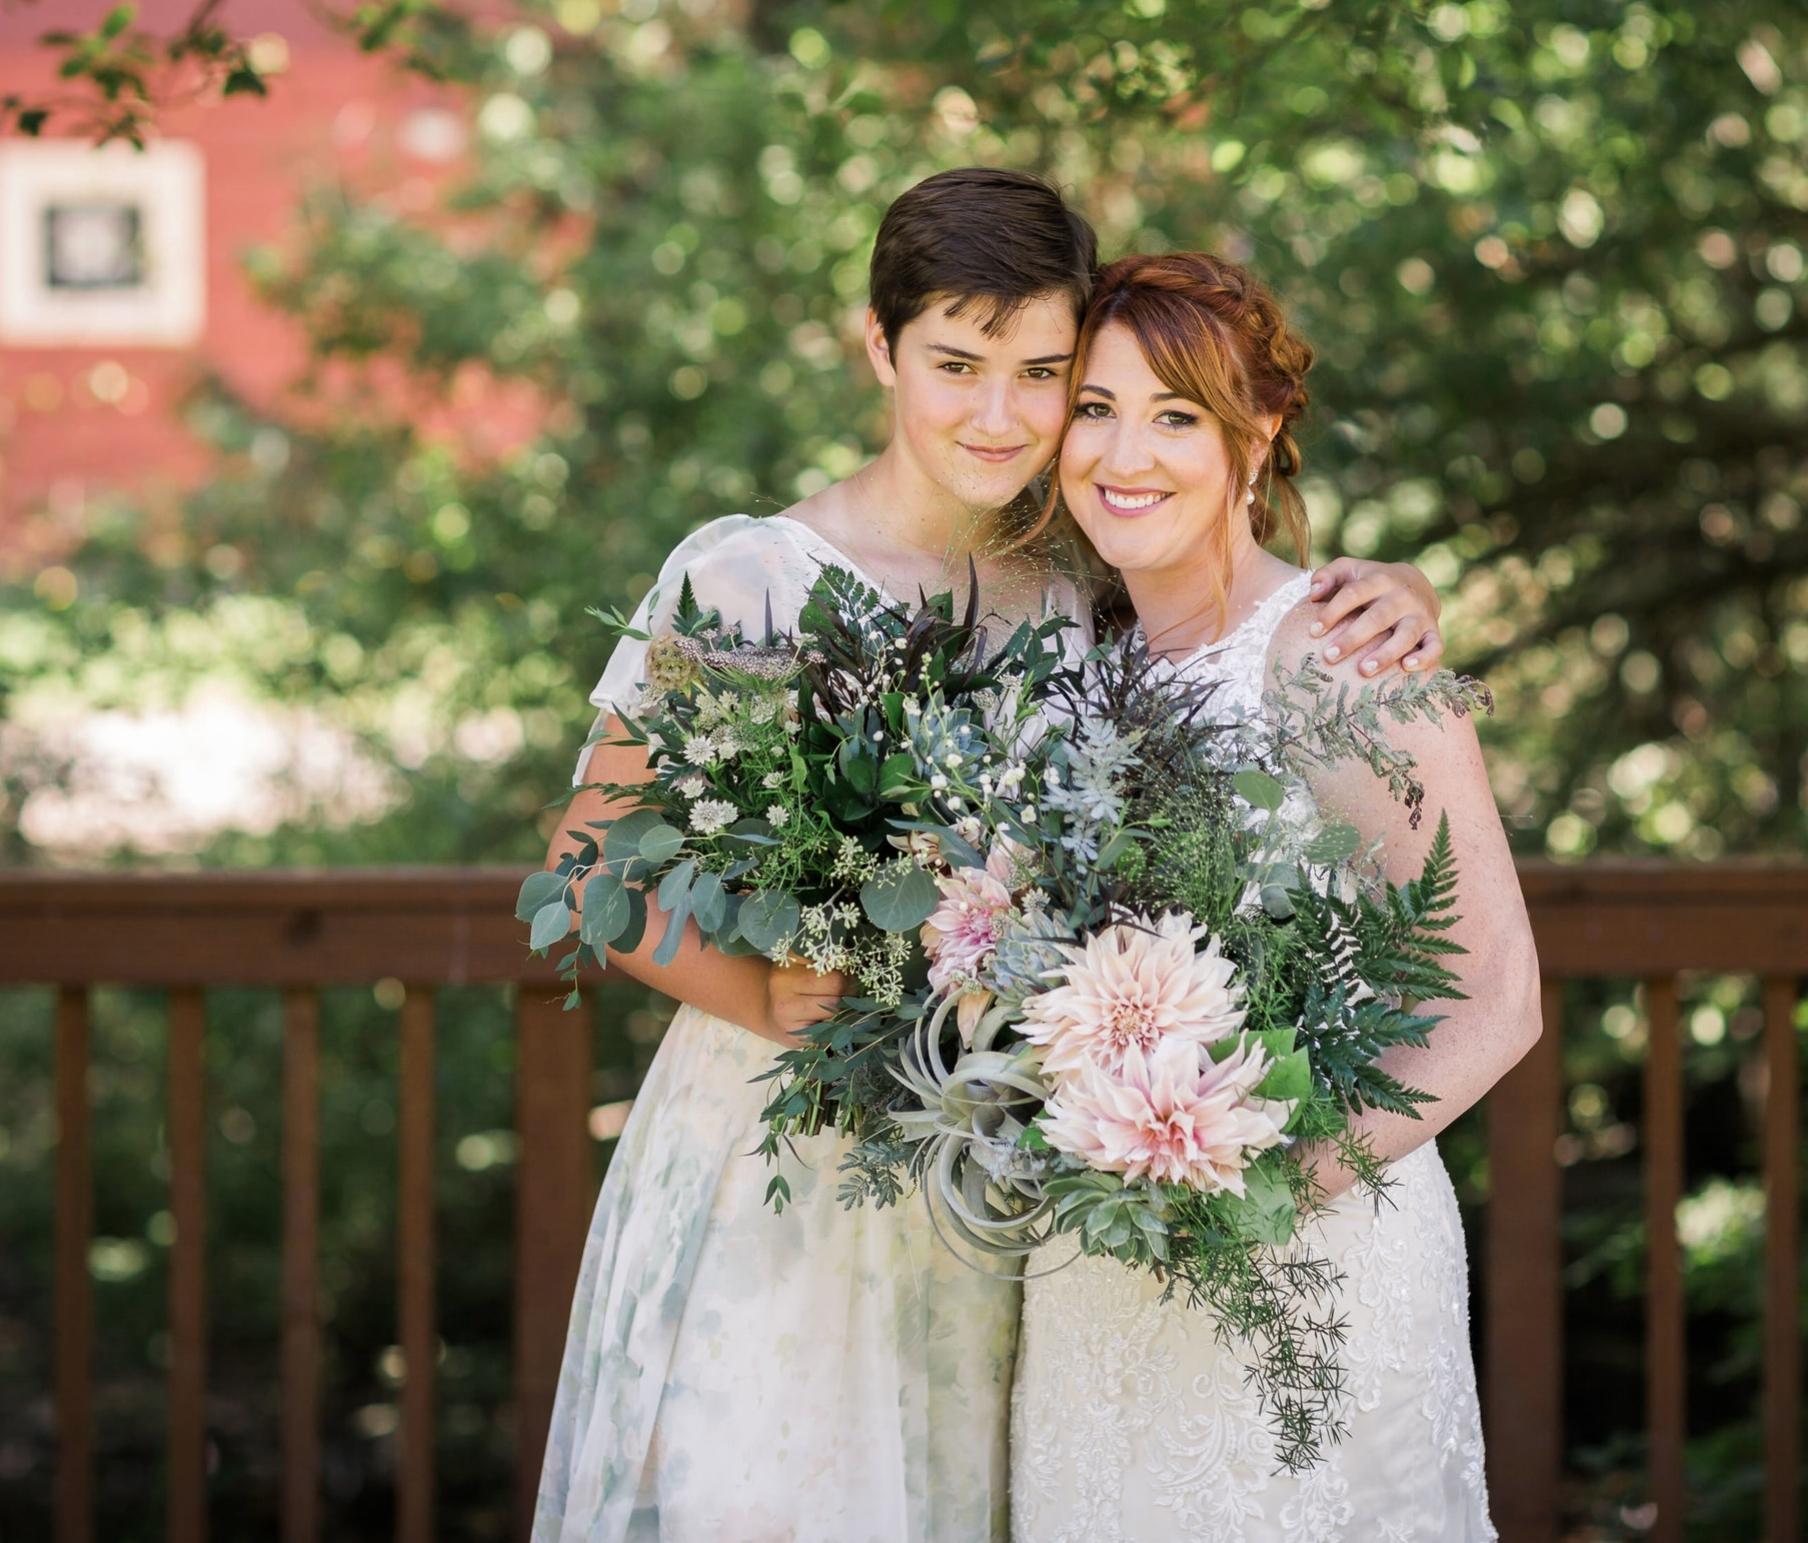 Dahlia, succulent & textured bouquets-Amy Galbraith Photography